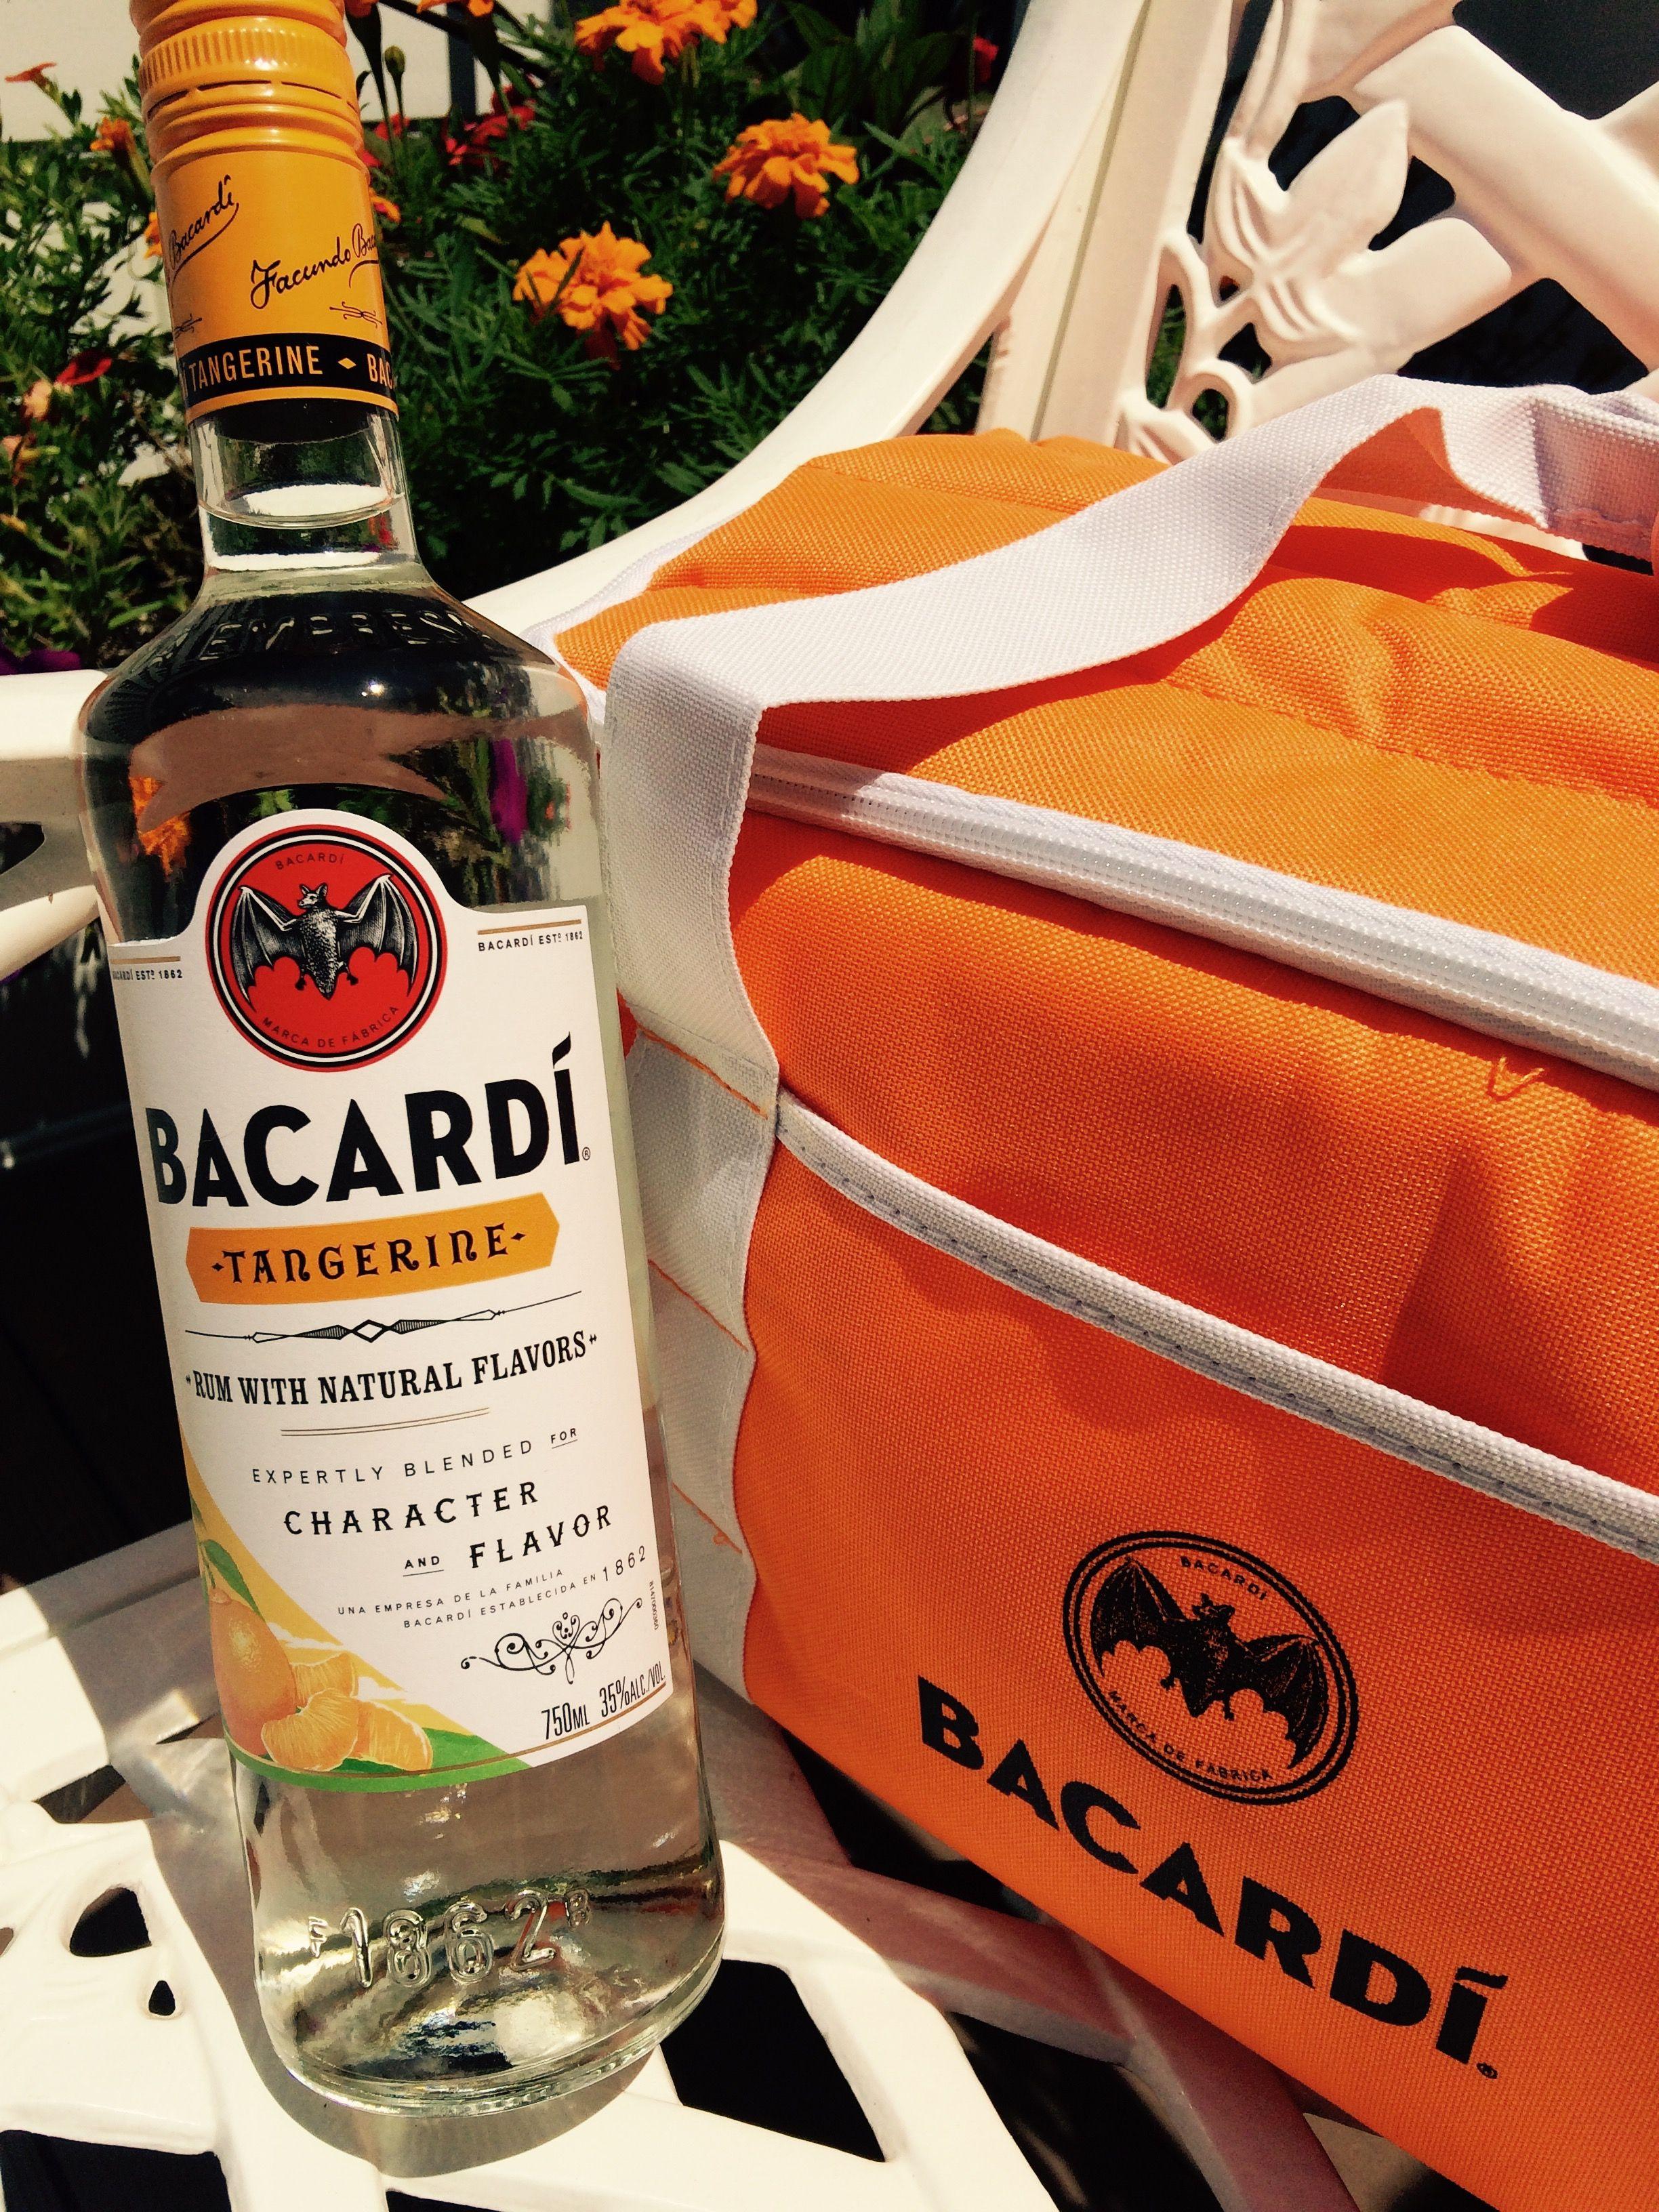 New Bacardi Tangerine Bartender Com Bacardi Tangerine Bacardi Rum